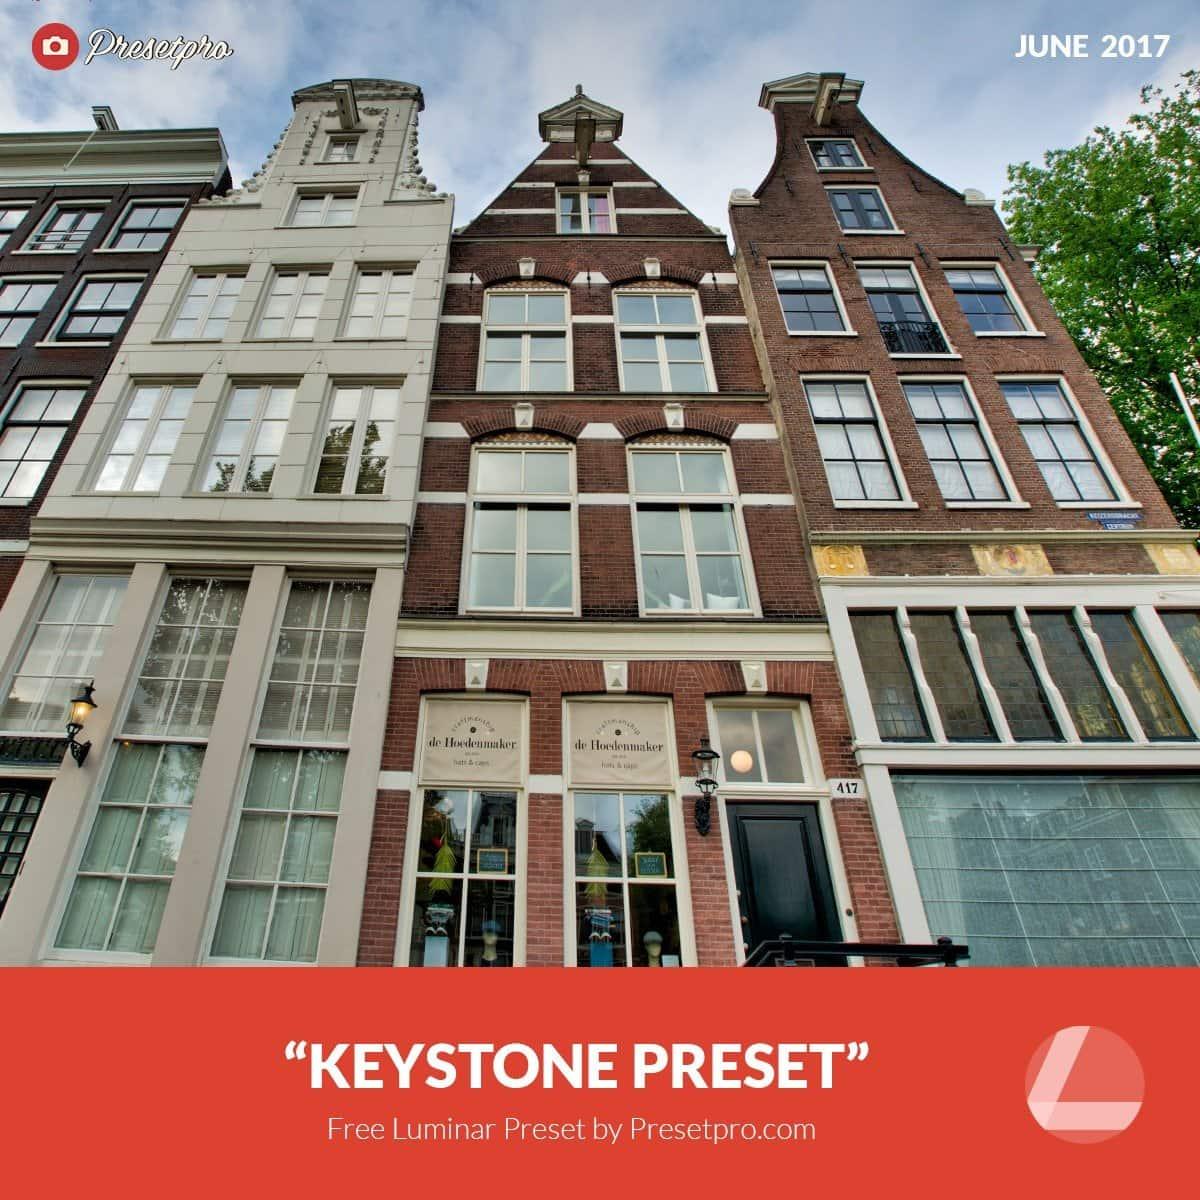 Free-Luminar-Preset-Keystone-Presetpro.com